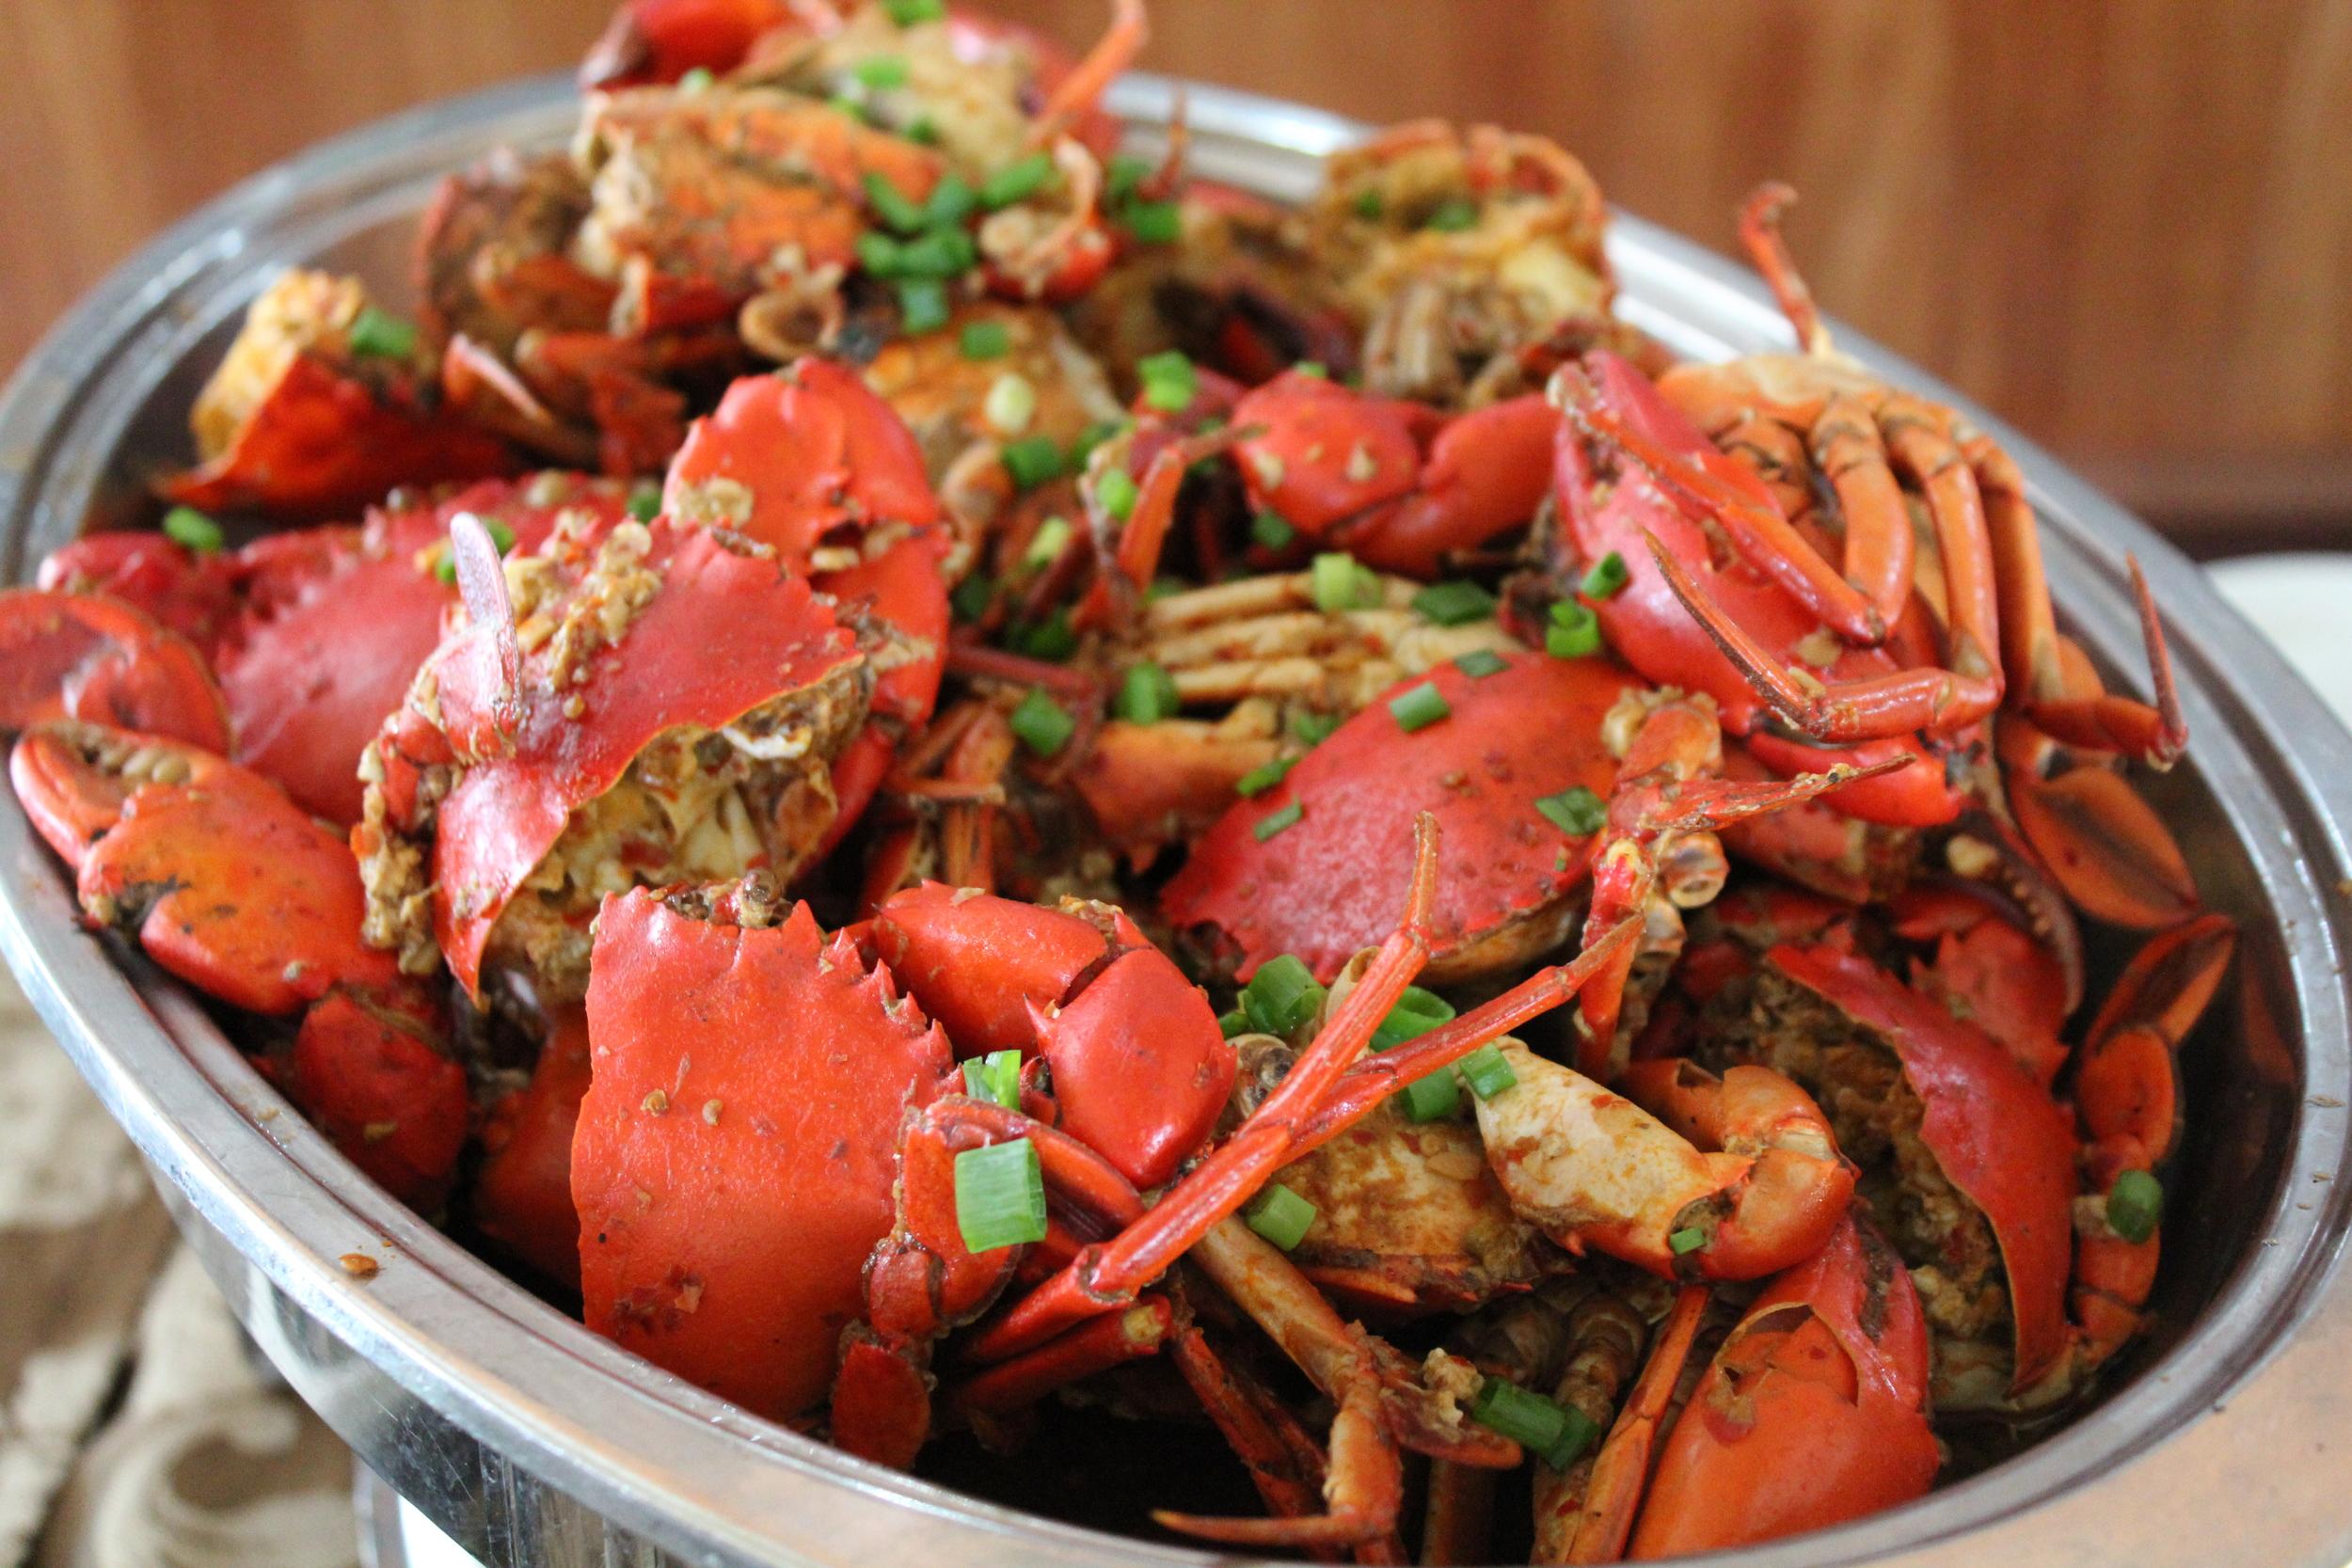 Coconut crab, Badjao Seafood restaurant, Palawan, Philippines. Photo credit, Sarahlynn Pablo.